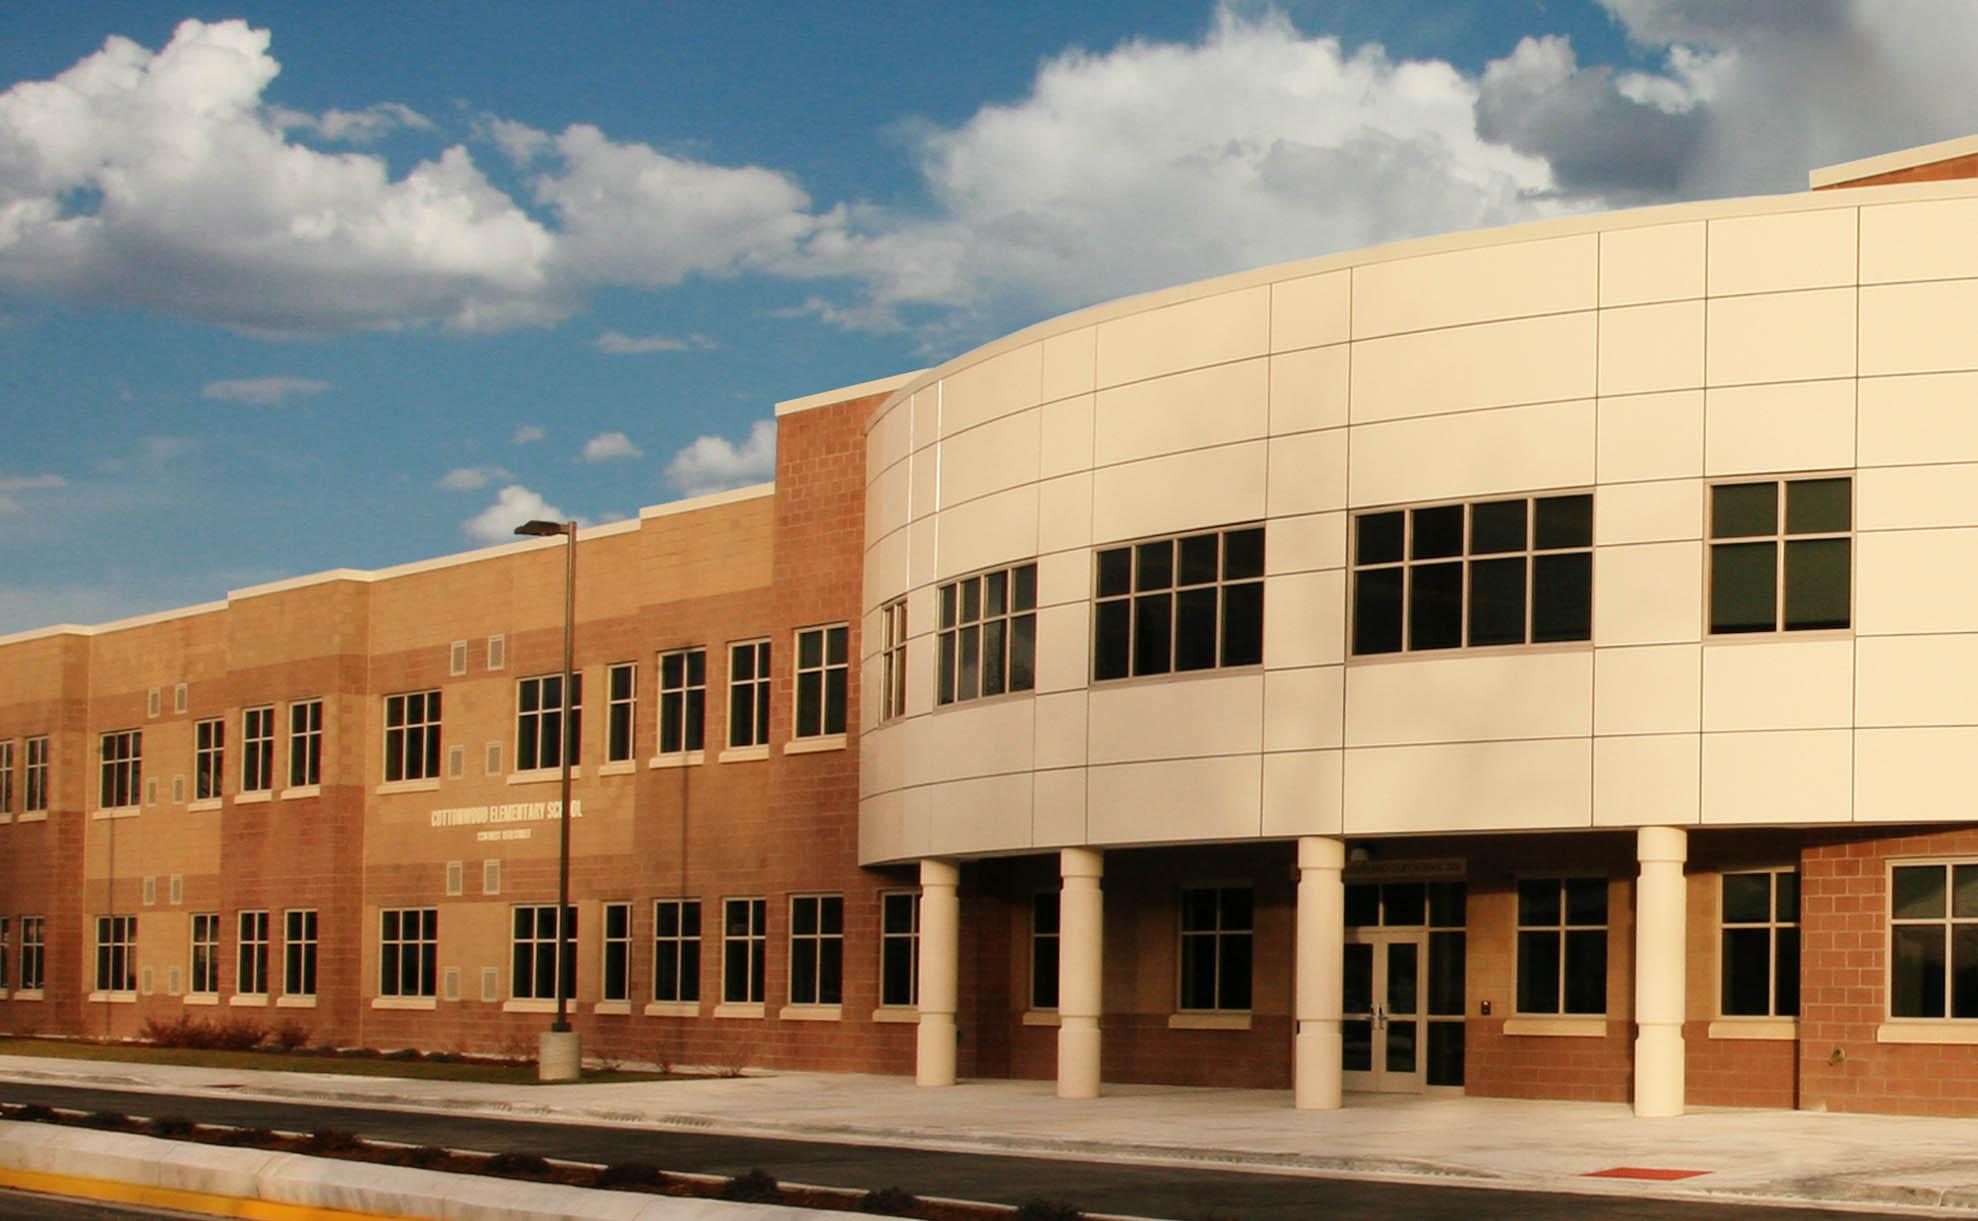 Cottonwood Elementary School Casper Wyoming